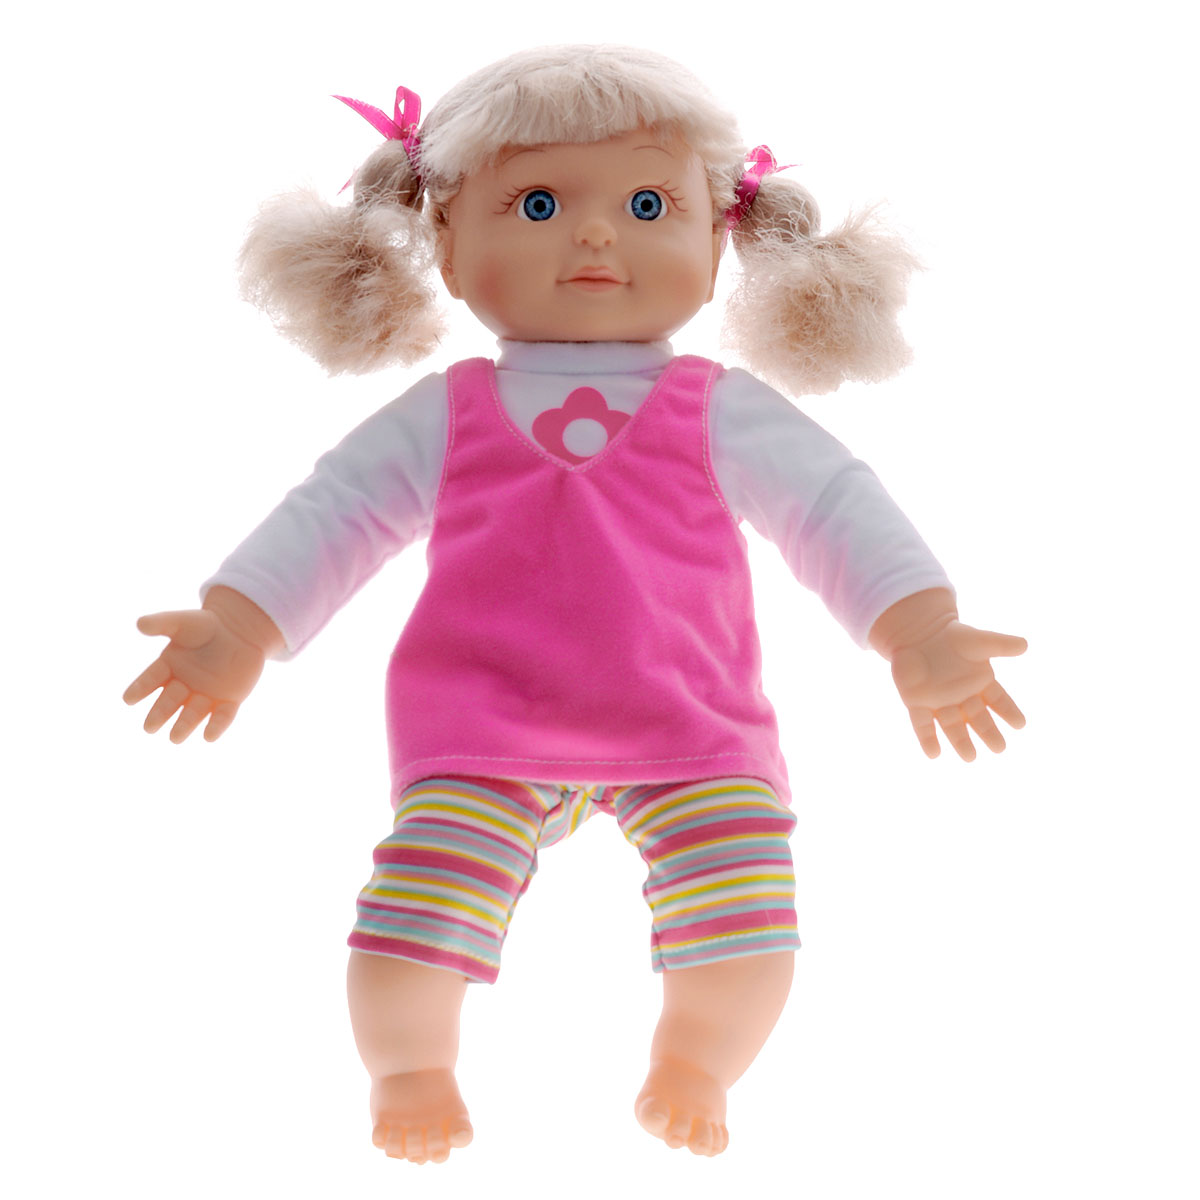 Mary Poppins Интерактивная кукла Алена  учу части тела, 38 см